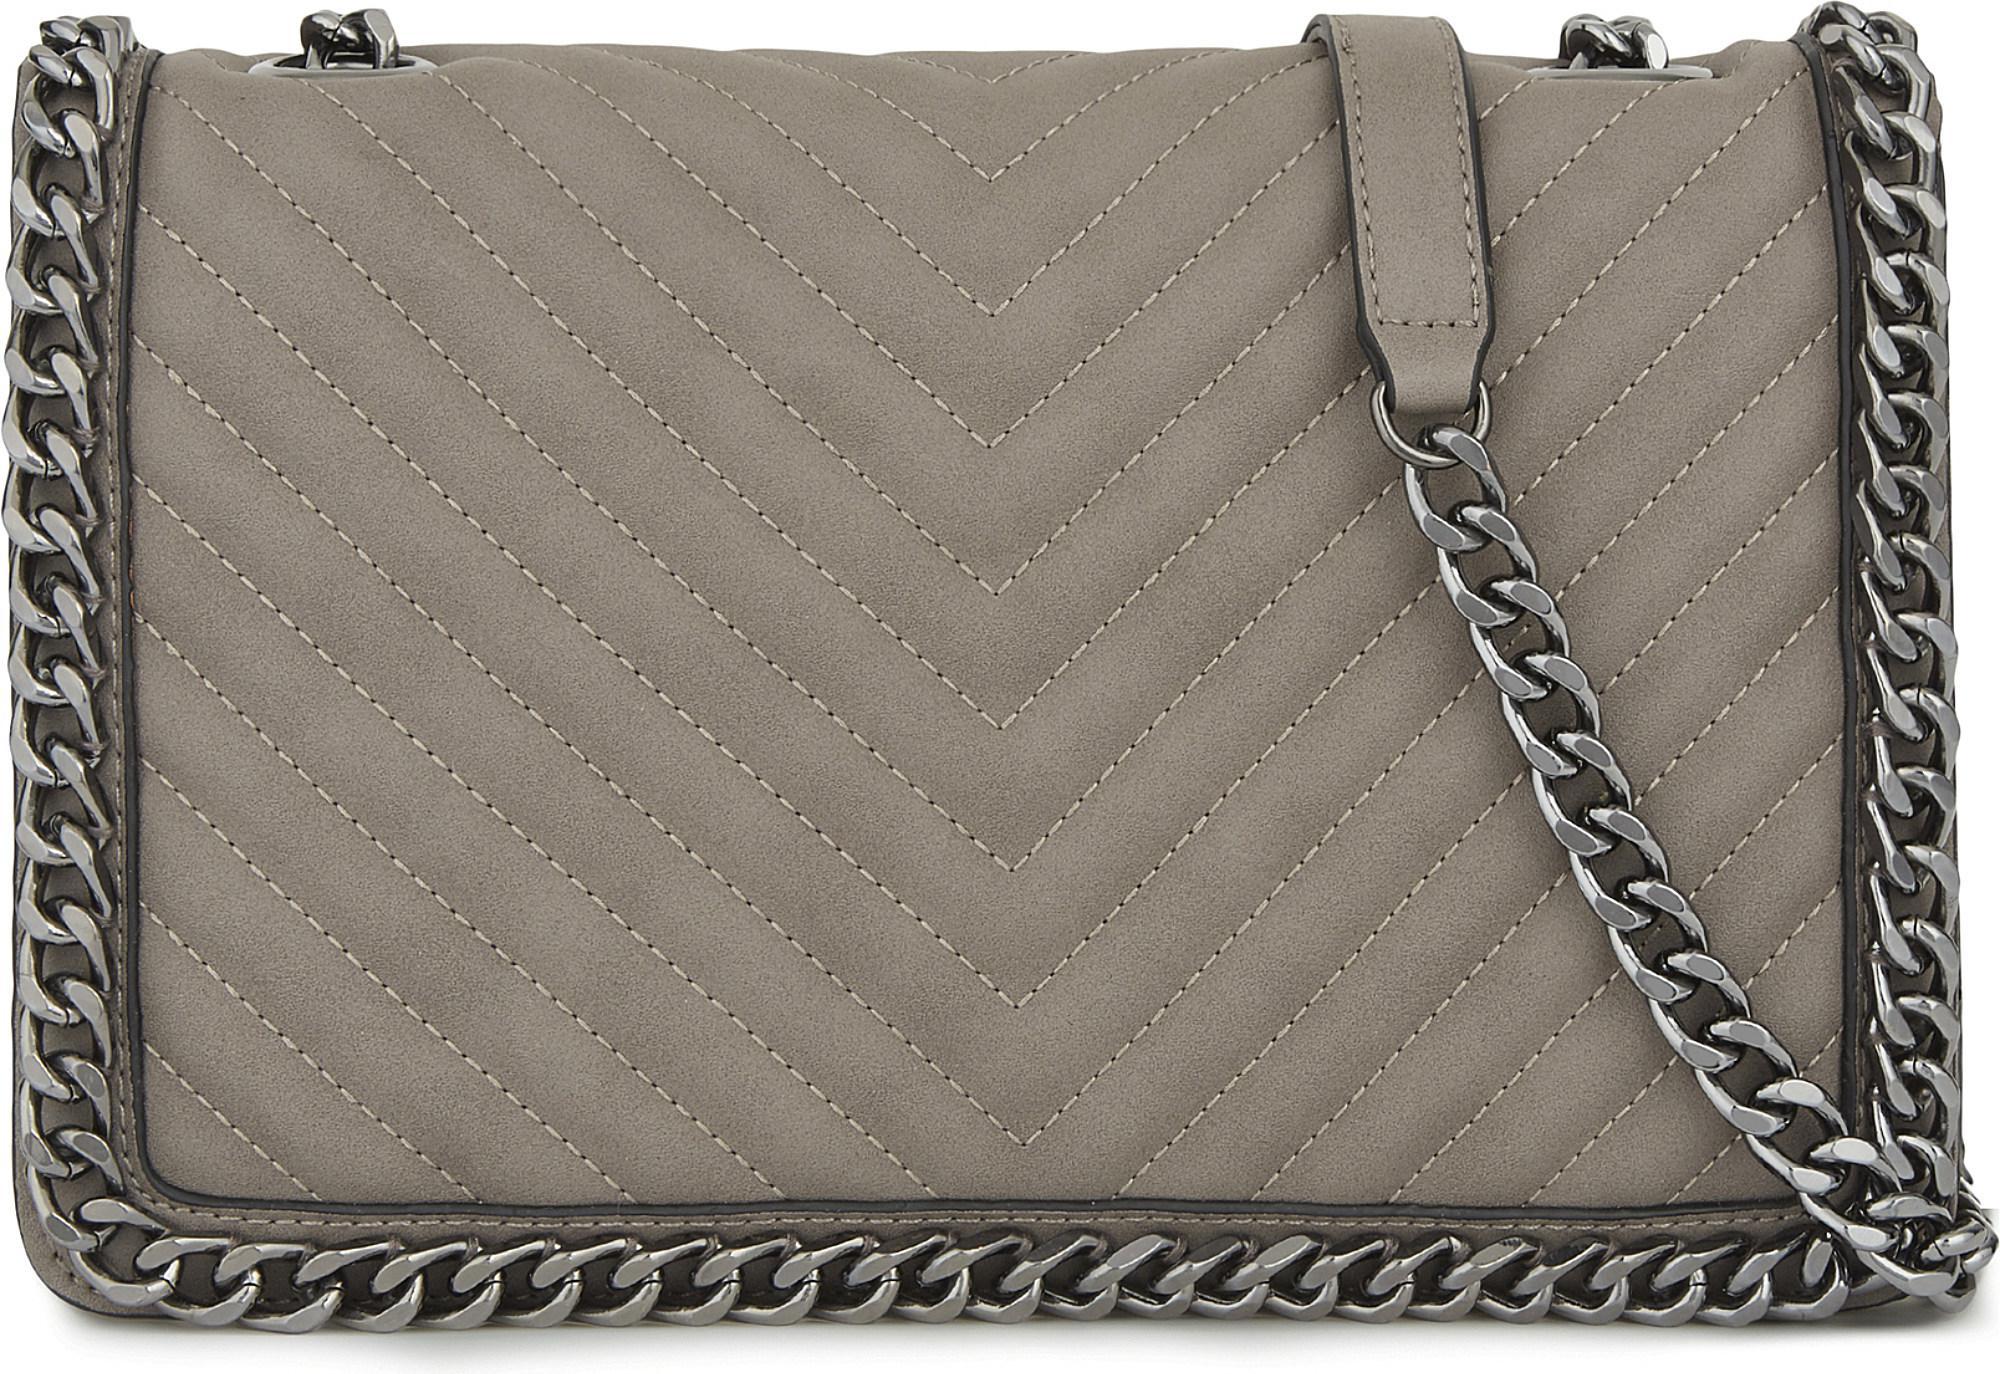 adc6147dba8 Lyst - ALDO Greenwald Faux-leather Shoulder Bag in Gray